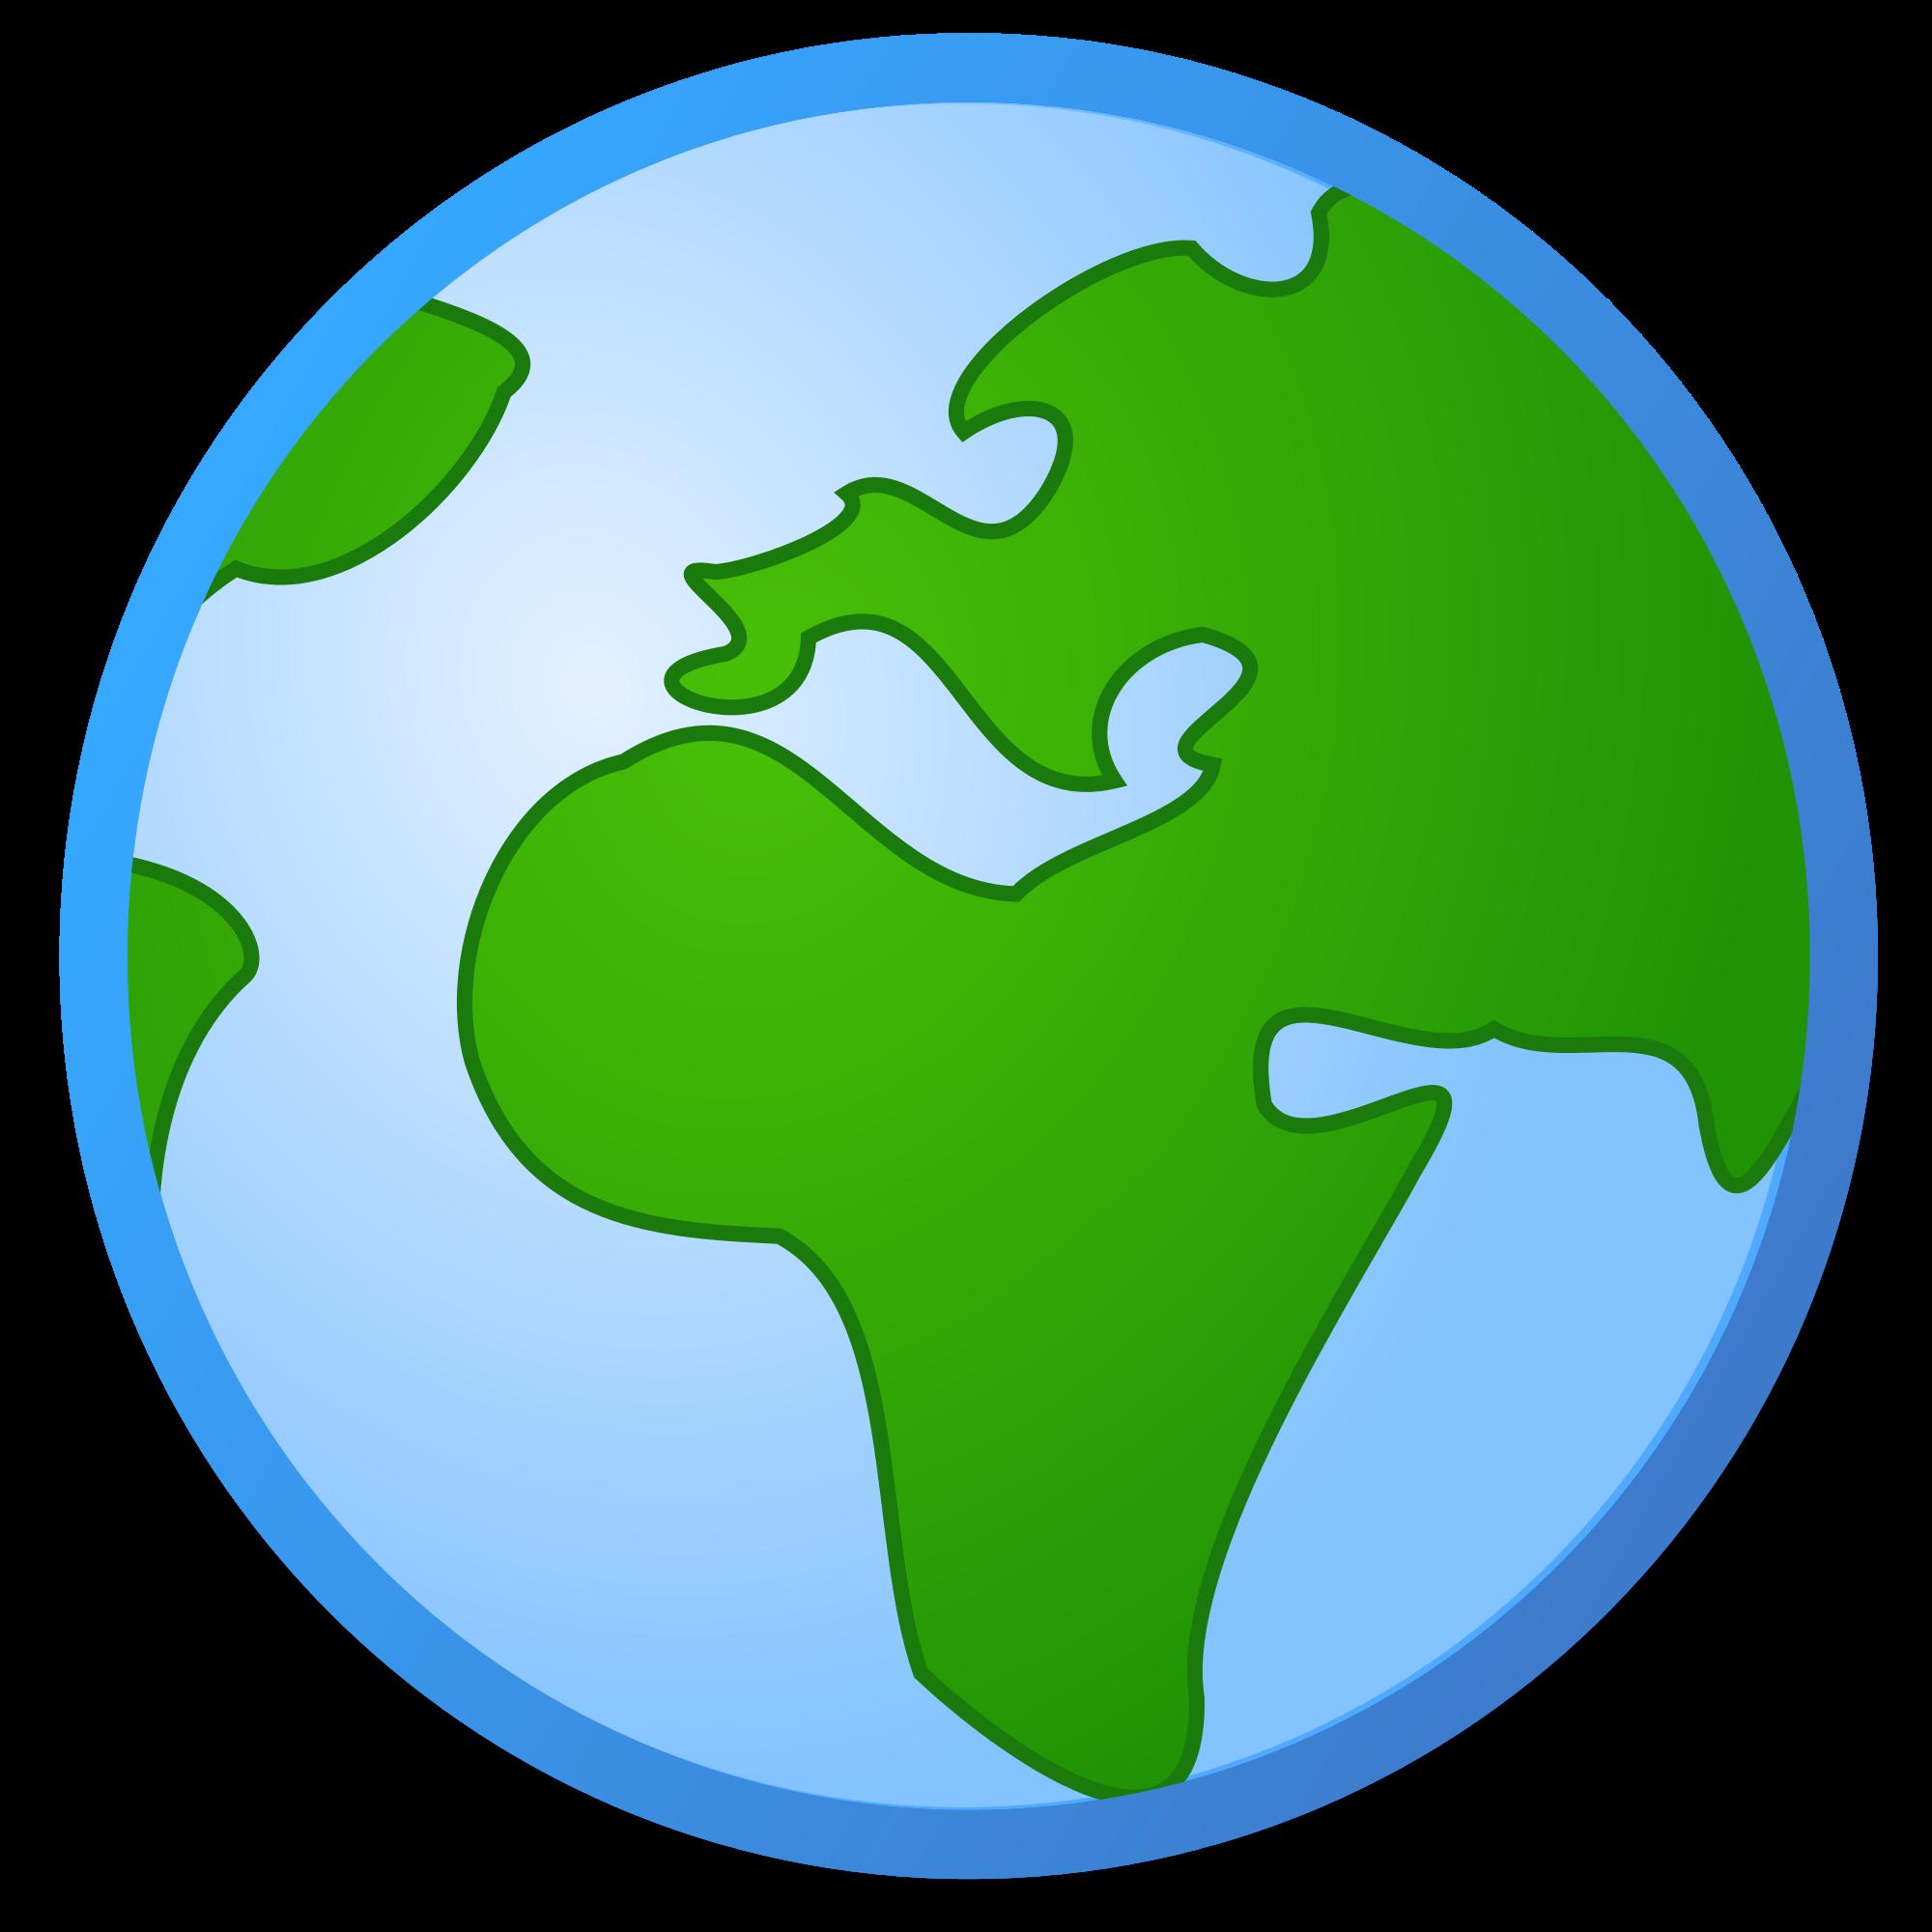 Clipart globe current event. File ambox svg wikimedia